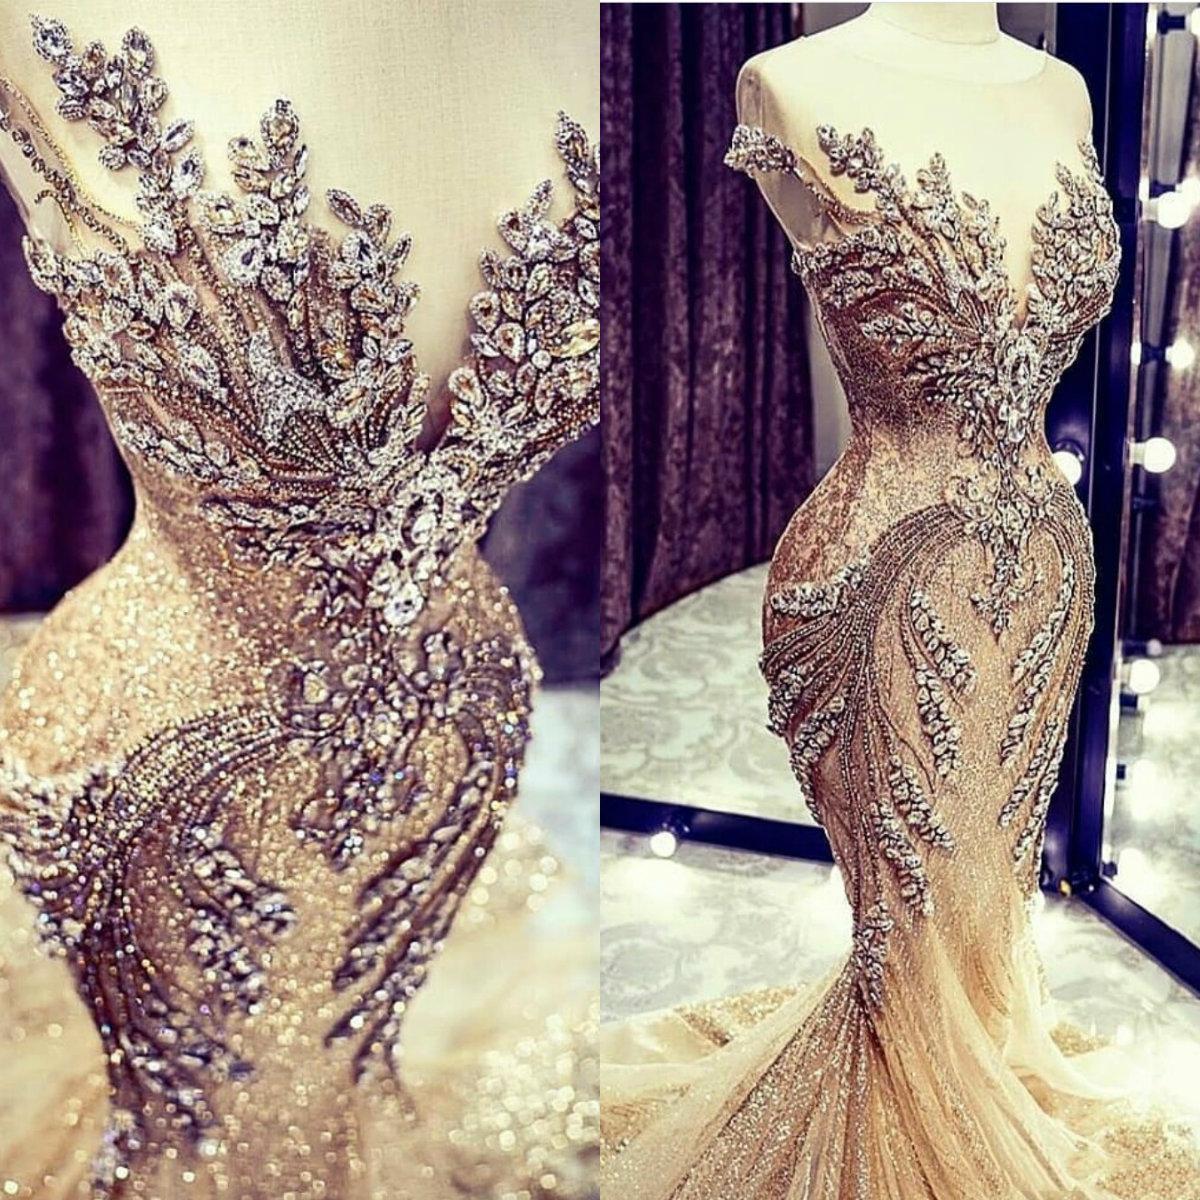 Robe de mariée Champagne Perles de cristal en dentelle Saisiss Balayer Beang Col Mermaid Robe de mariée Vraie Image Robes de mariée de luxe